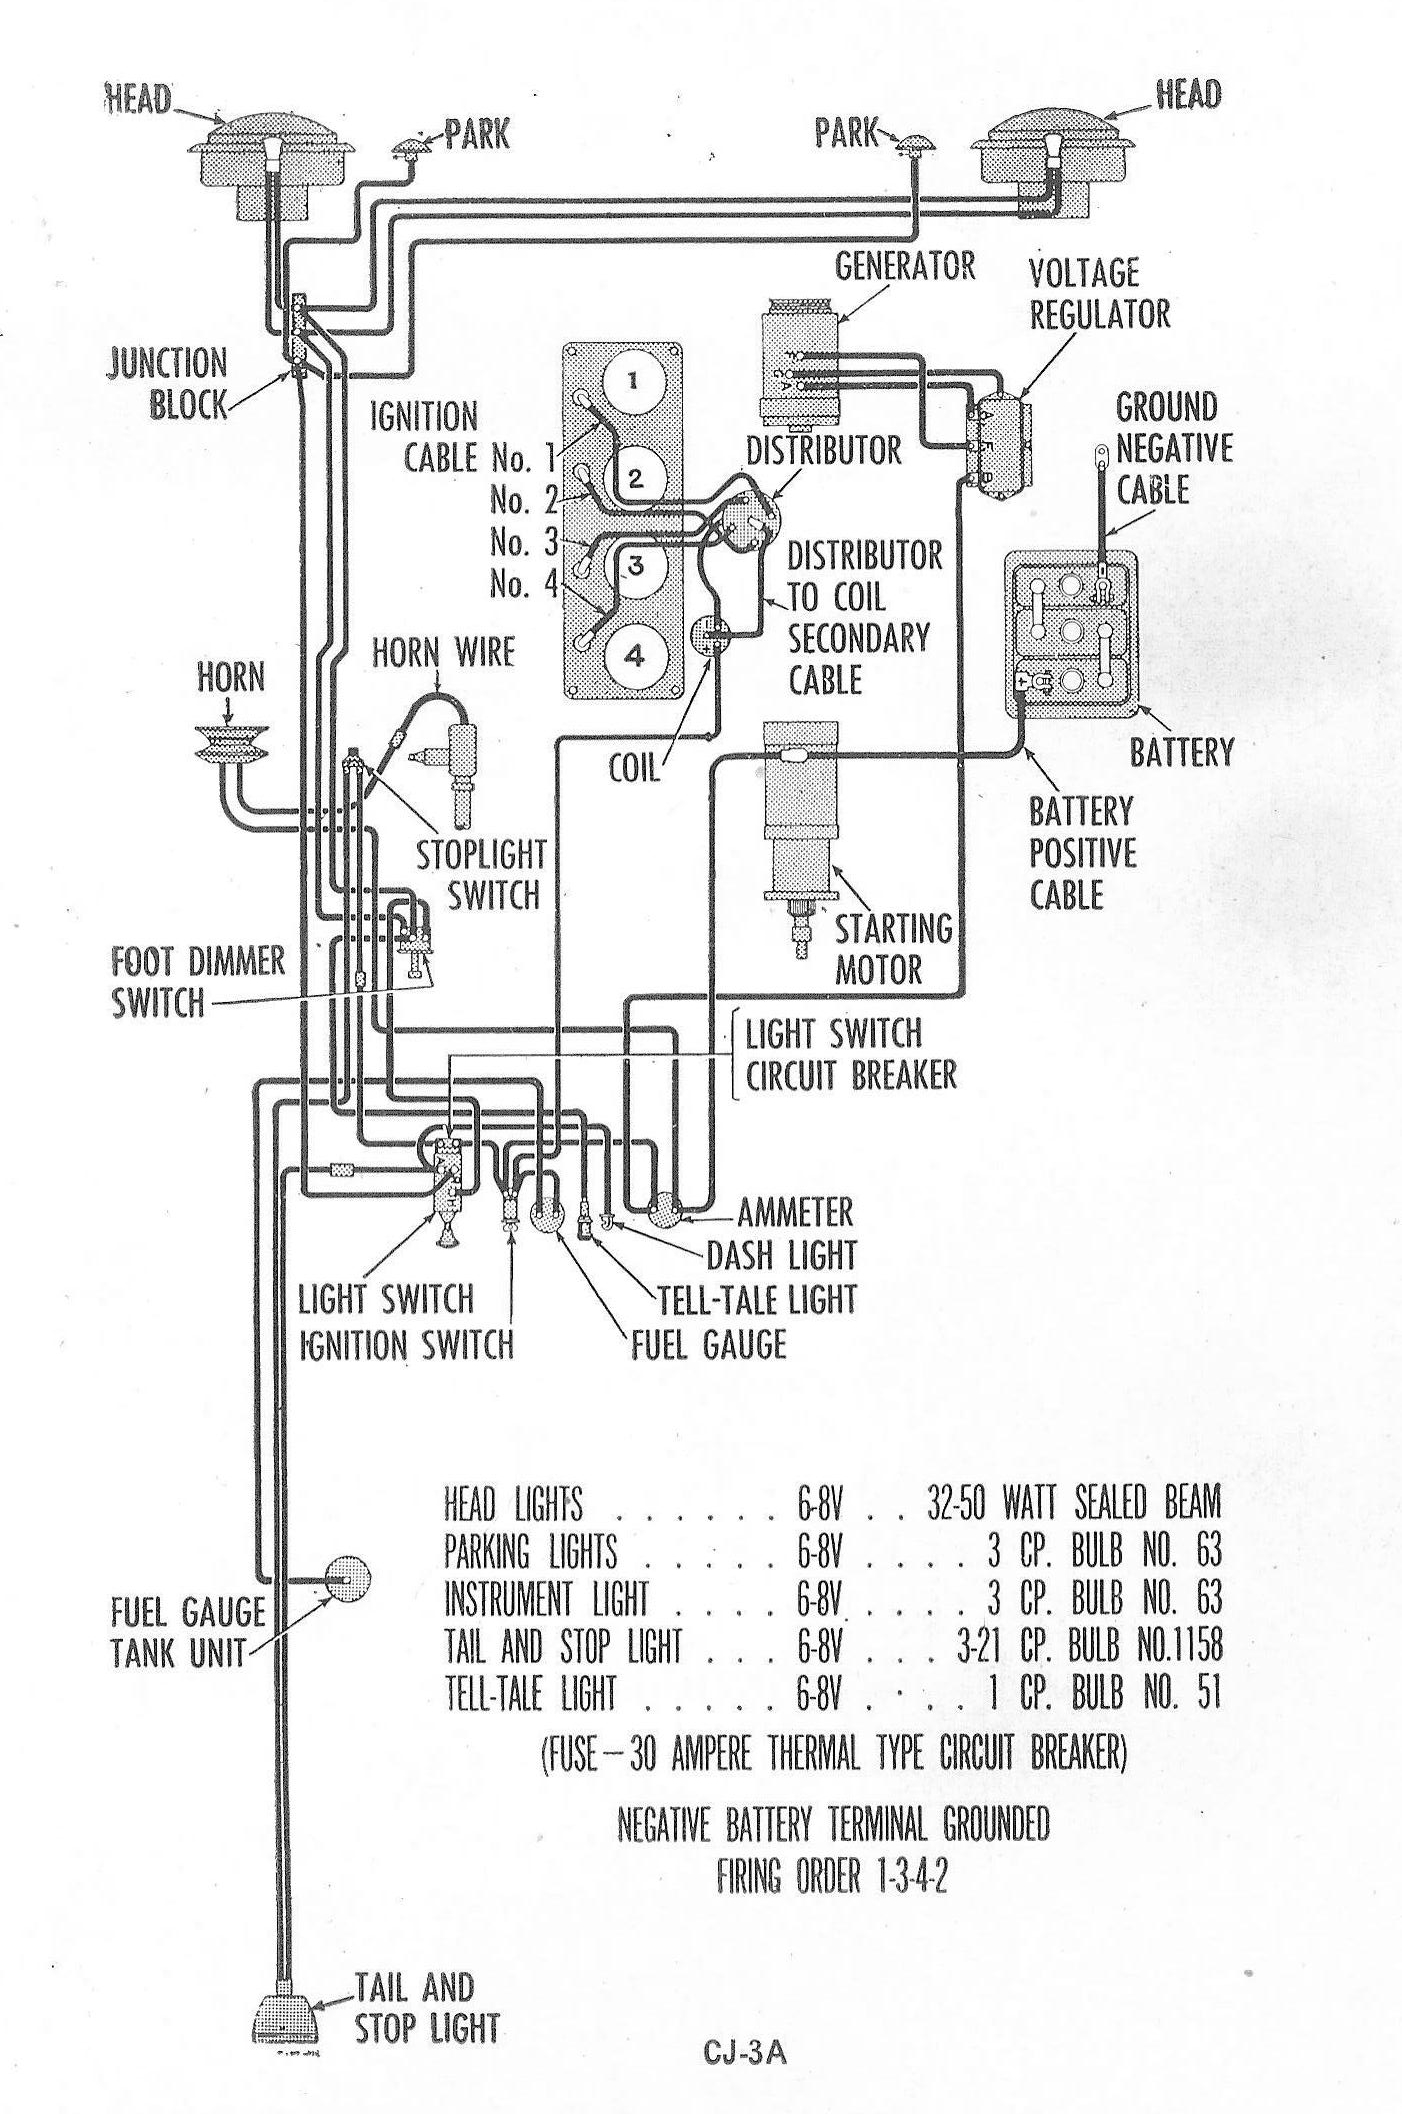 me_7216] 1955 willys jeep wiring schematic wiring diagram  rine bachi kargi viha hicag mohammedshrine librar wiring 101